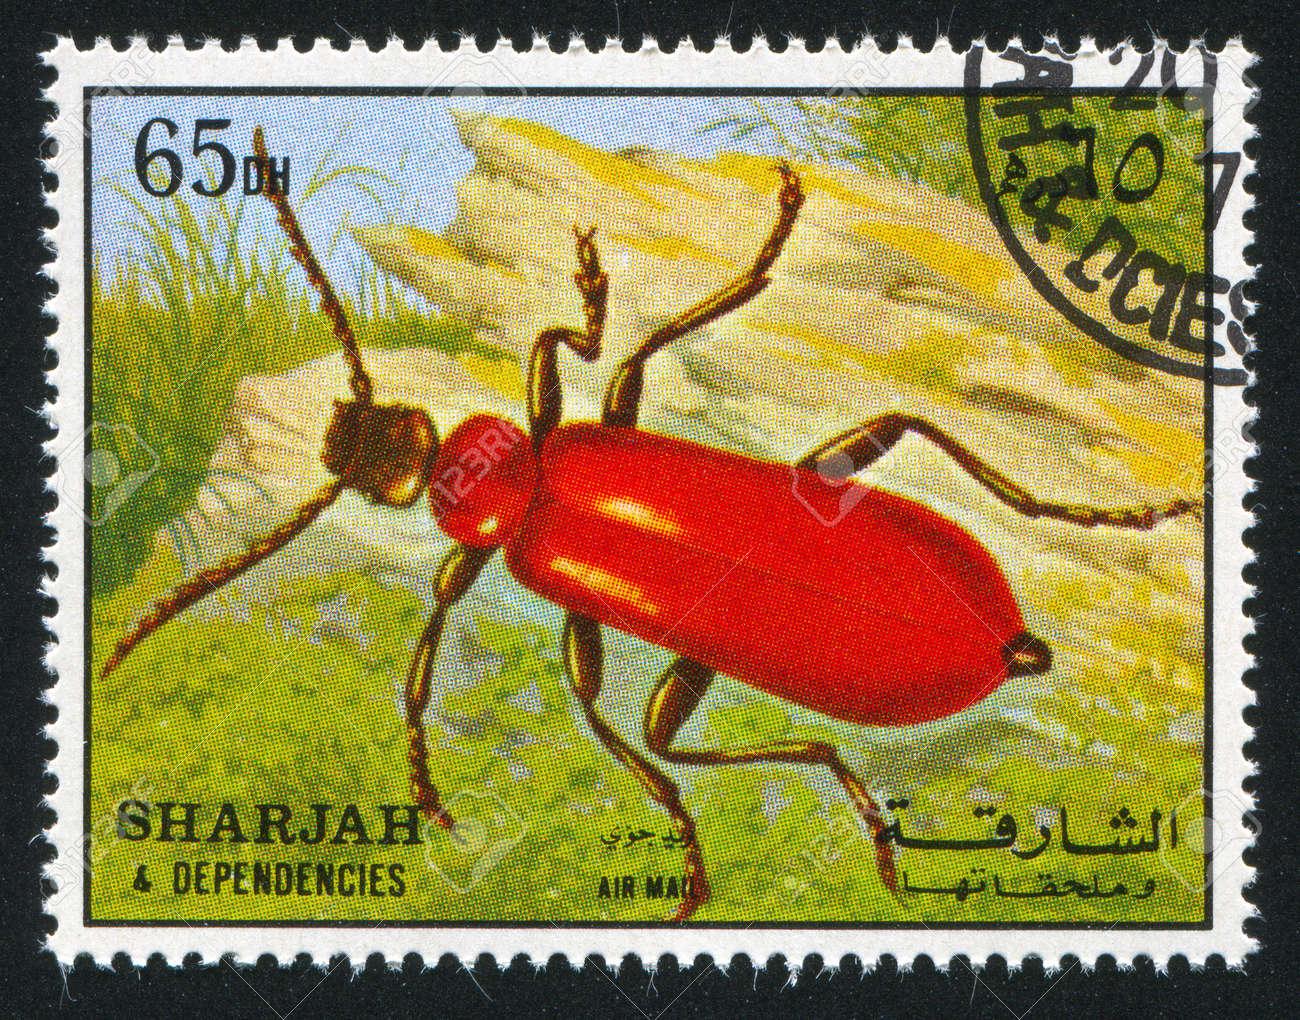 SHARJAH AND DEPENDENCIES - CIRCA 1972: stamp printed by Sharjah and Dependencies, shows a Beetle, circa 1972 Stock Photo - 17145616